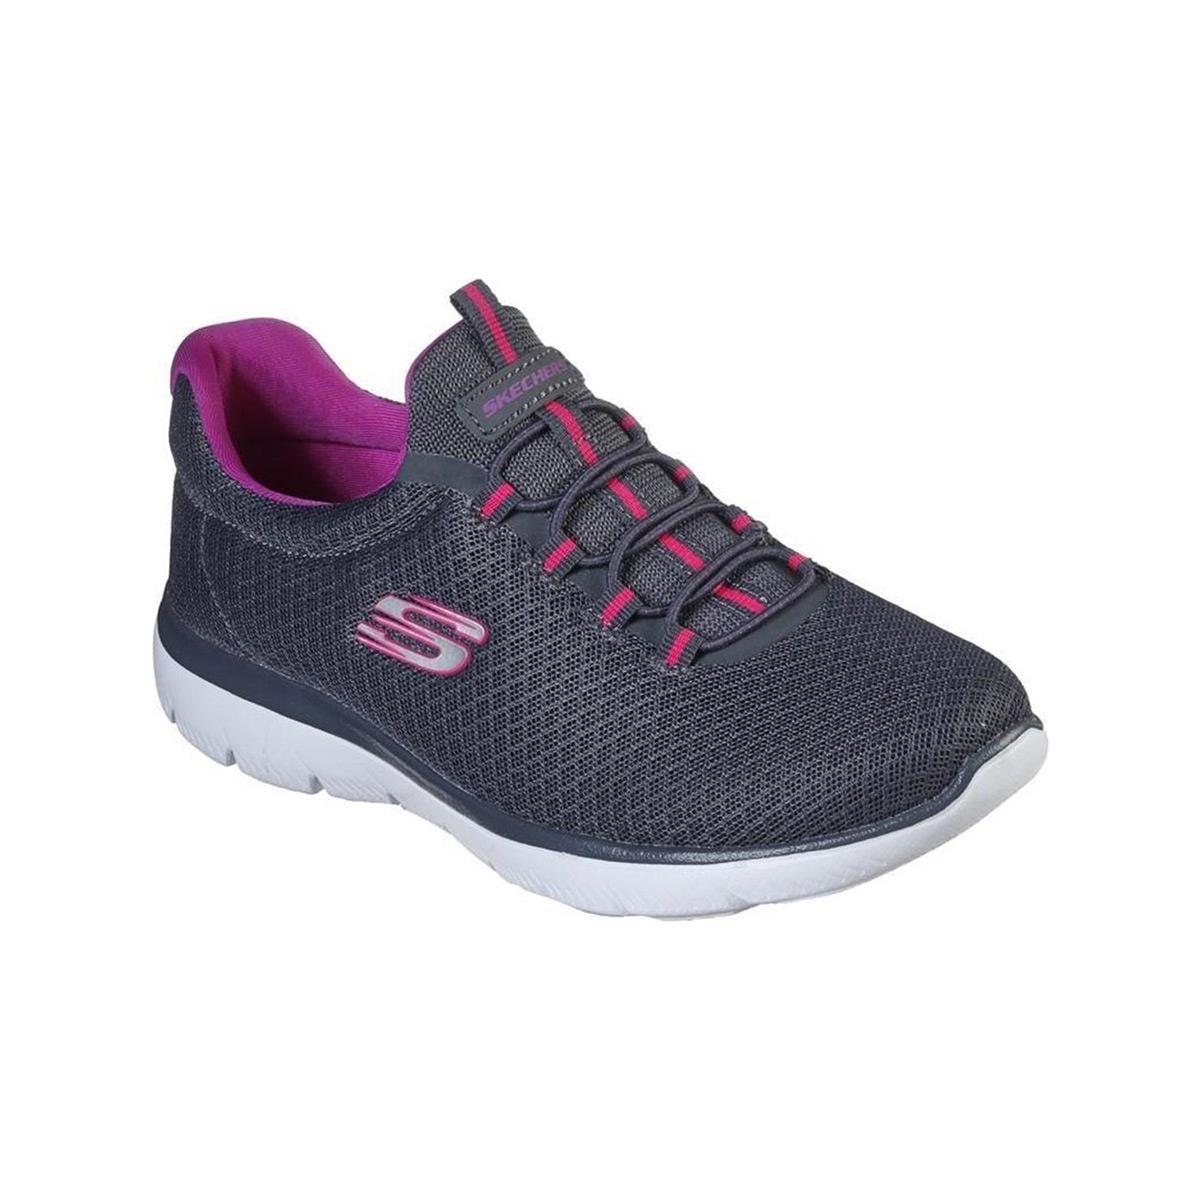 Skechers SUMMITS Bayan Ayakkabısı SKC12980 CCPR